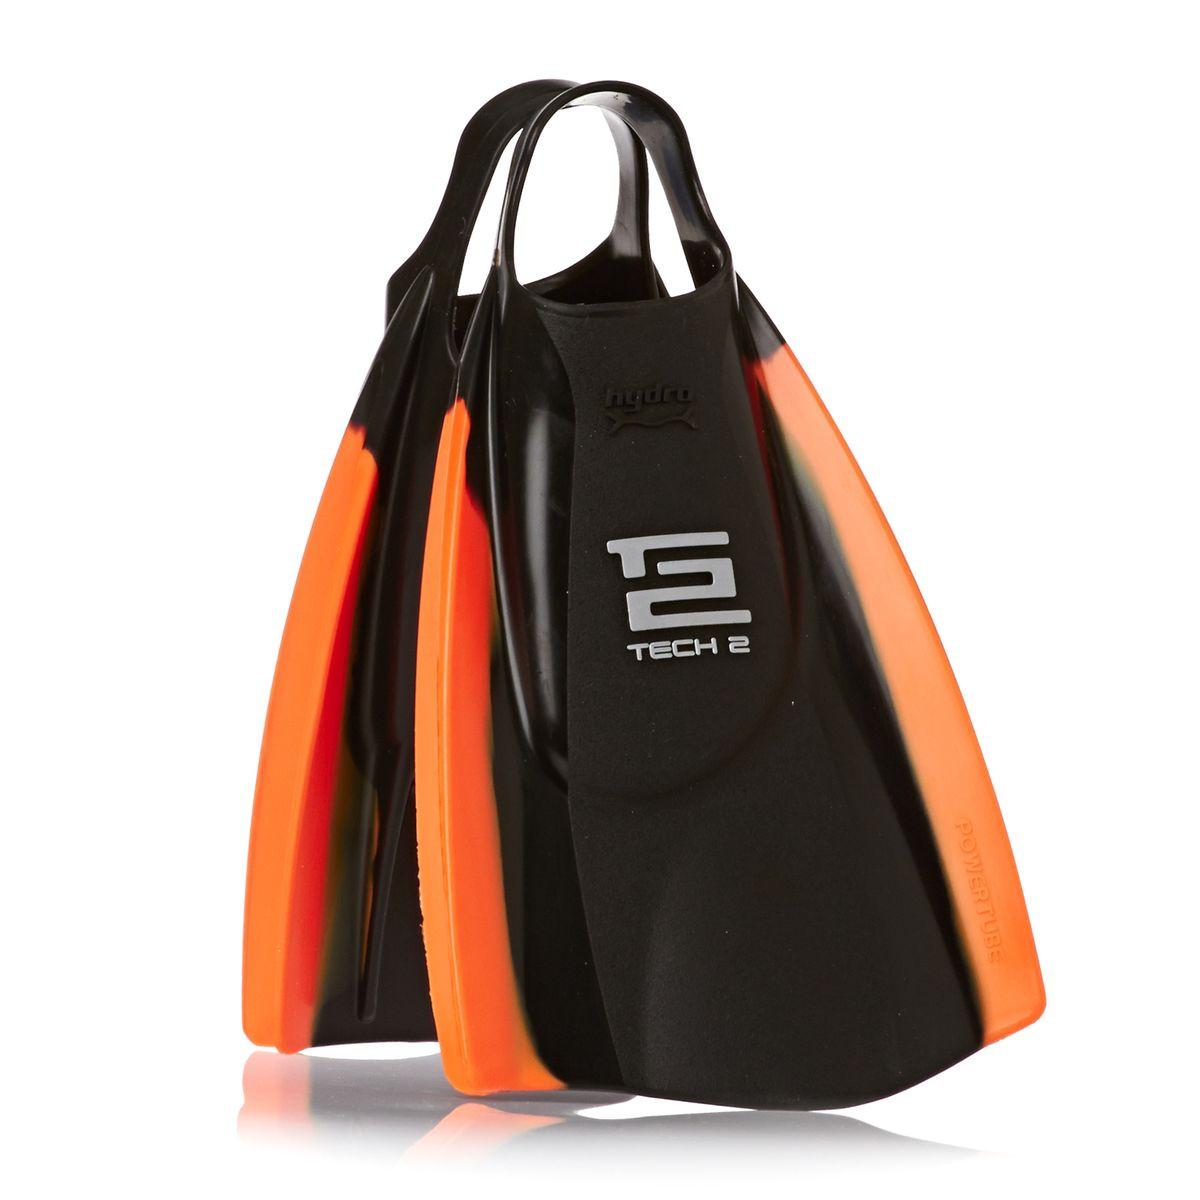 Hydro Tech 2 Bodyboard Fins - Black/ Orange